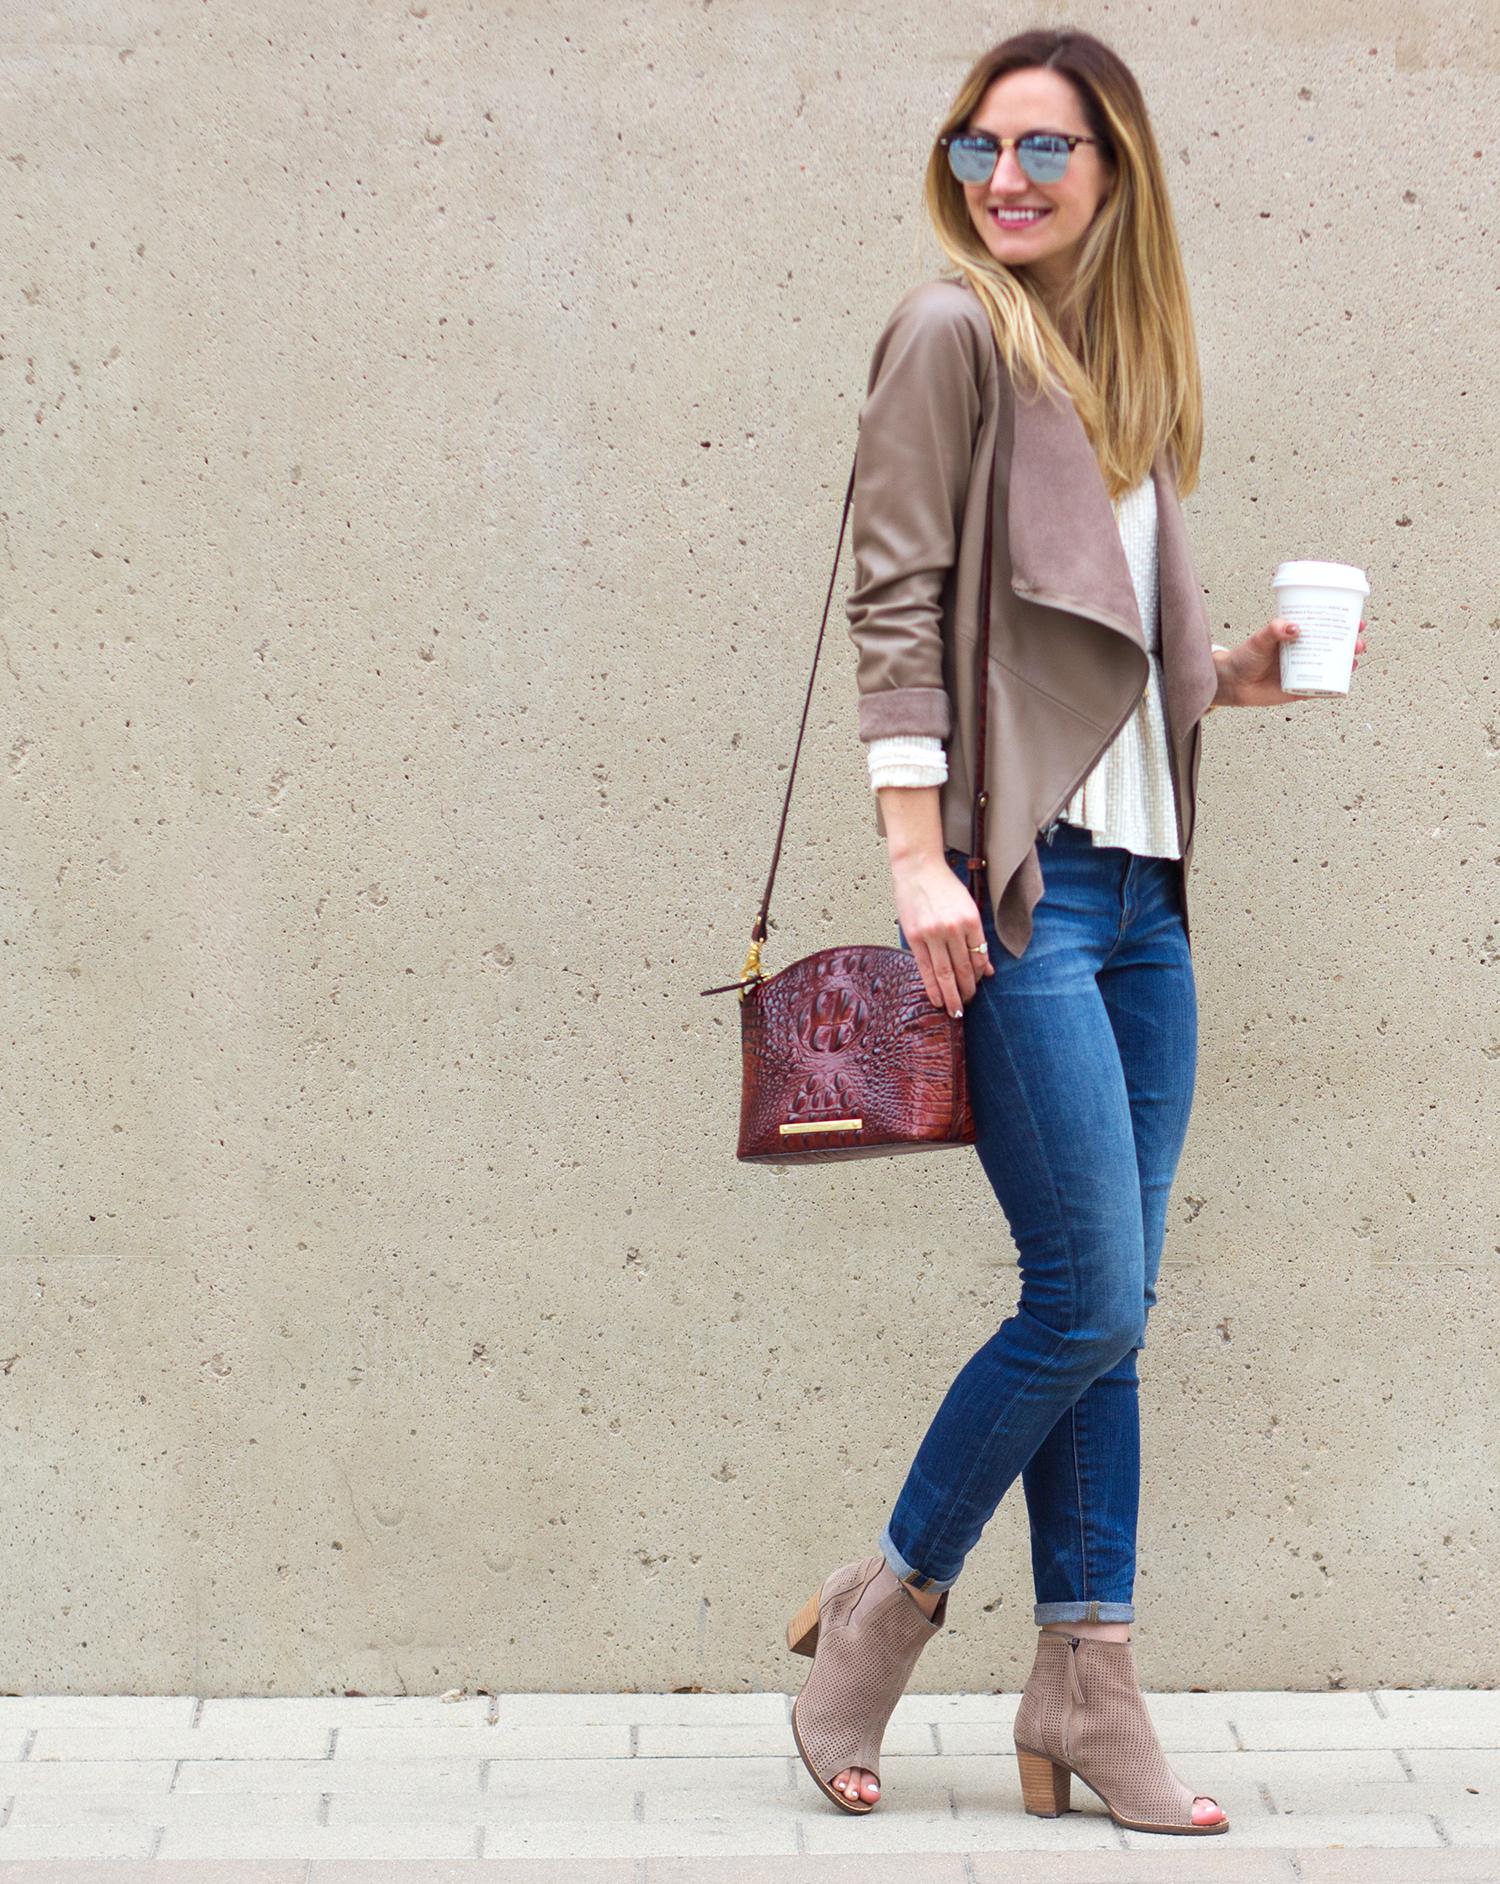 livvyland-blog-olivia-watson-austin-texas-fashion-blogger-madewell-skinny-jeans-bb-dakota-bradford-tan-draped-front-jacket-brahmin-toms-majorca-booties-8